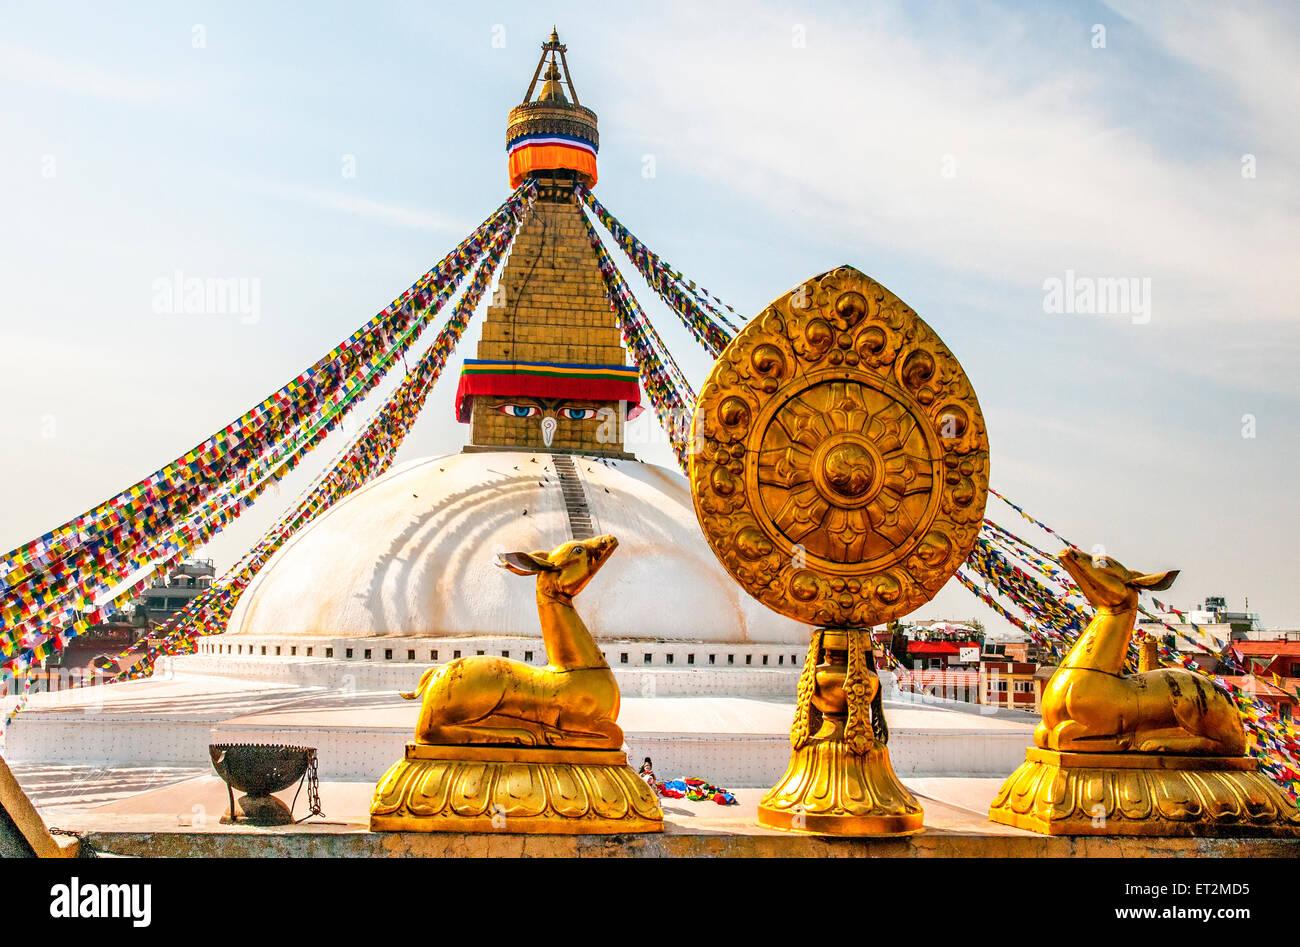 Prayer Flags at Boudhanath stupa in Kathmandu, Nepal - Stock Image